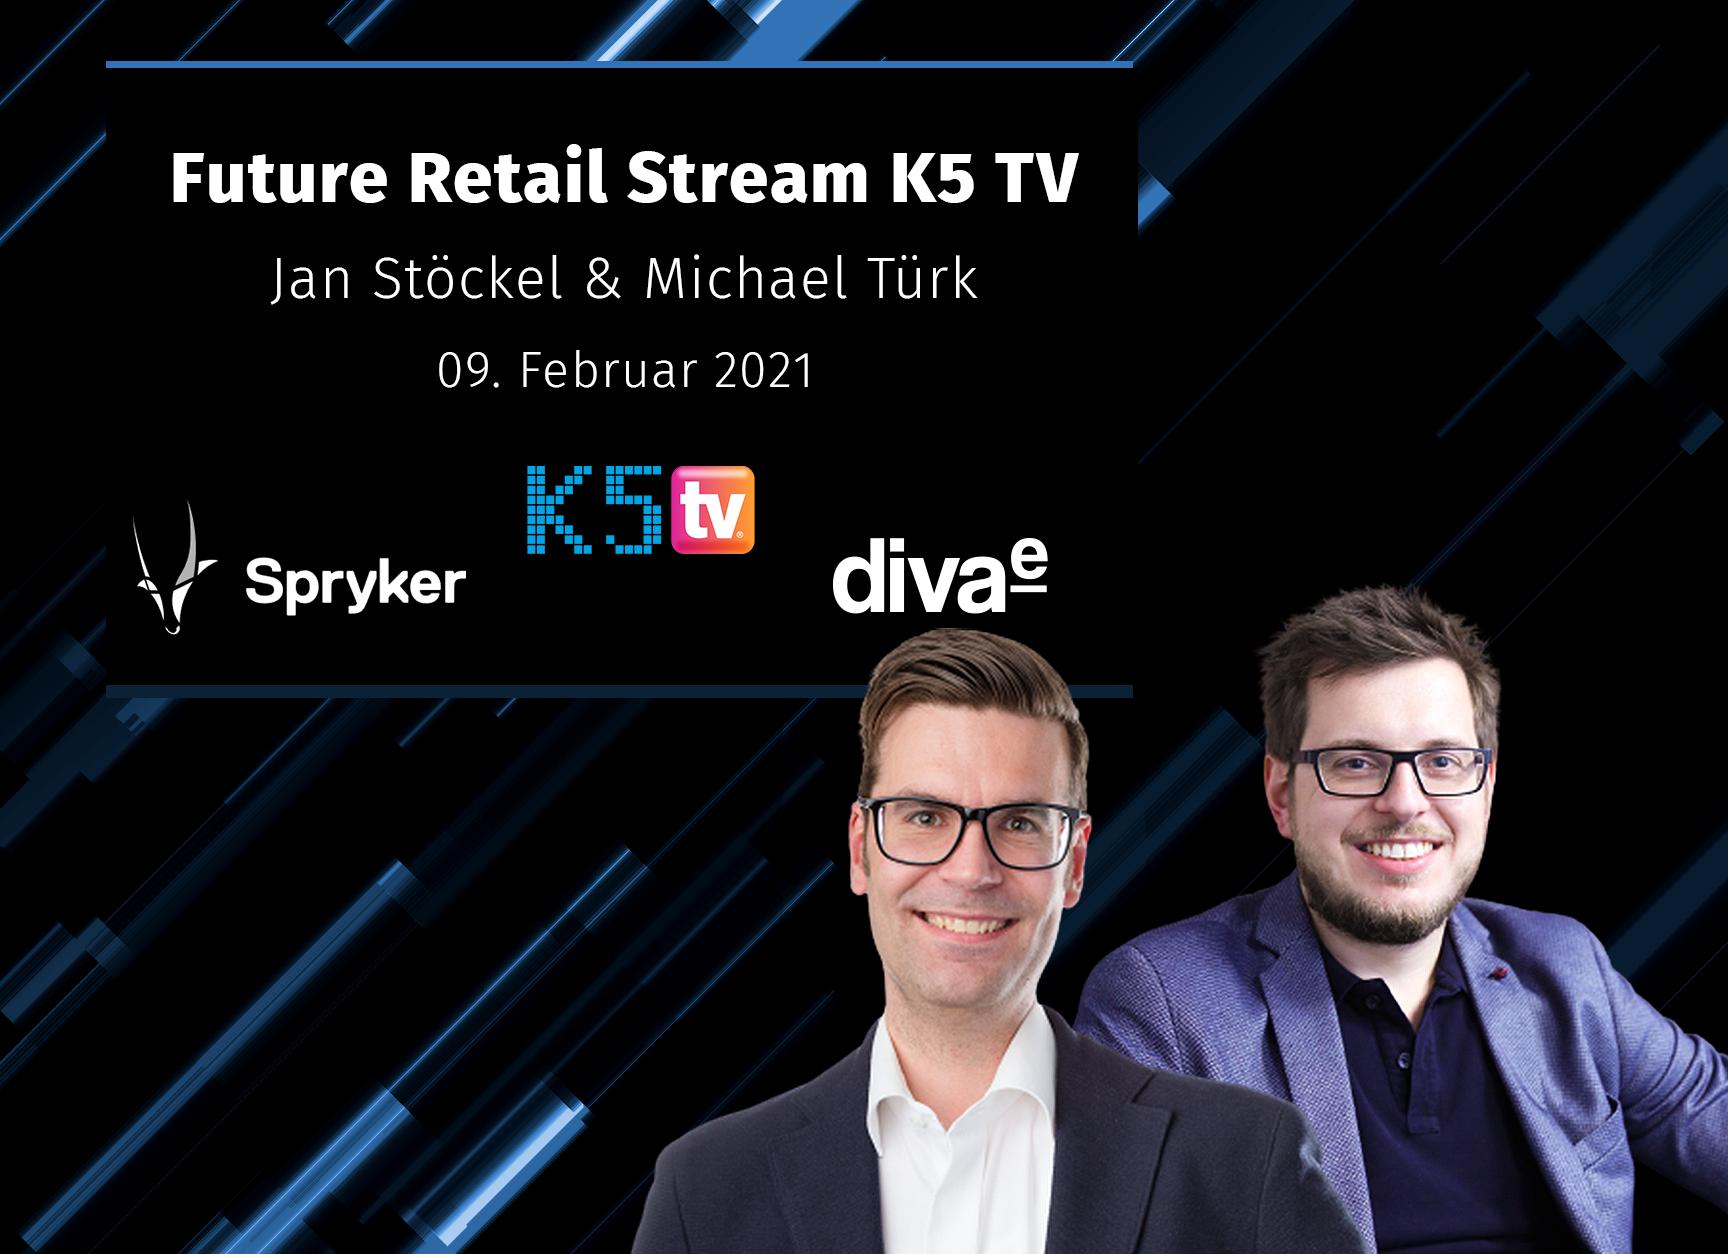 Future Retail Stream K5 TV